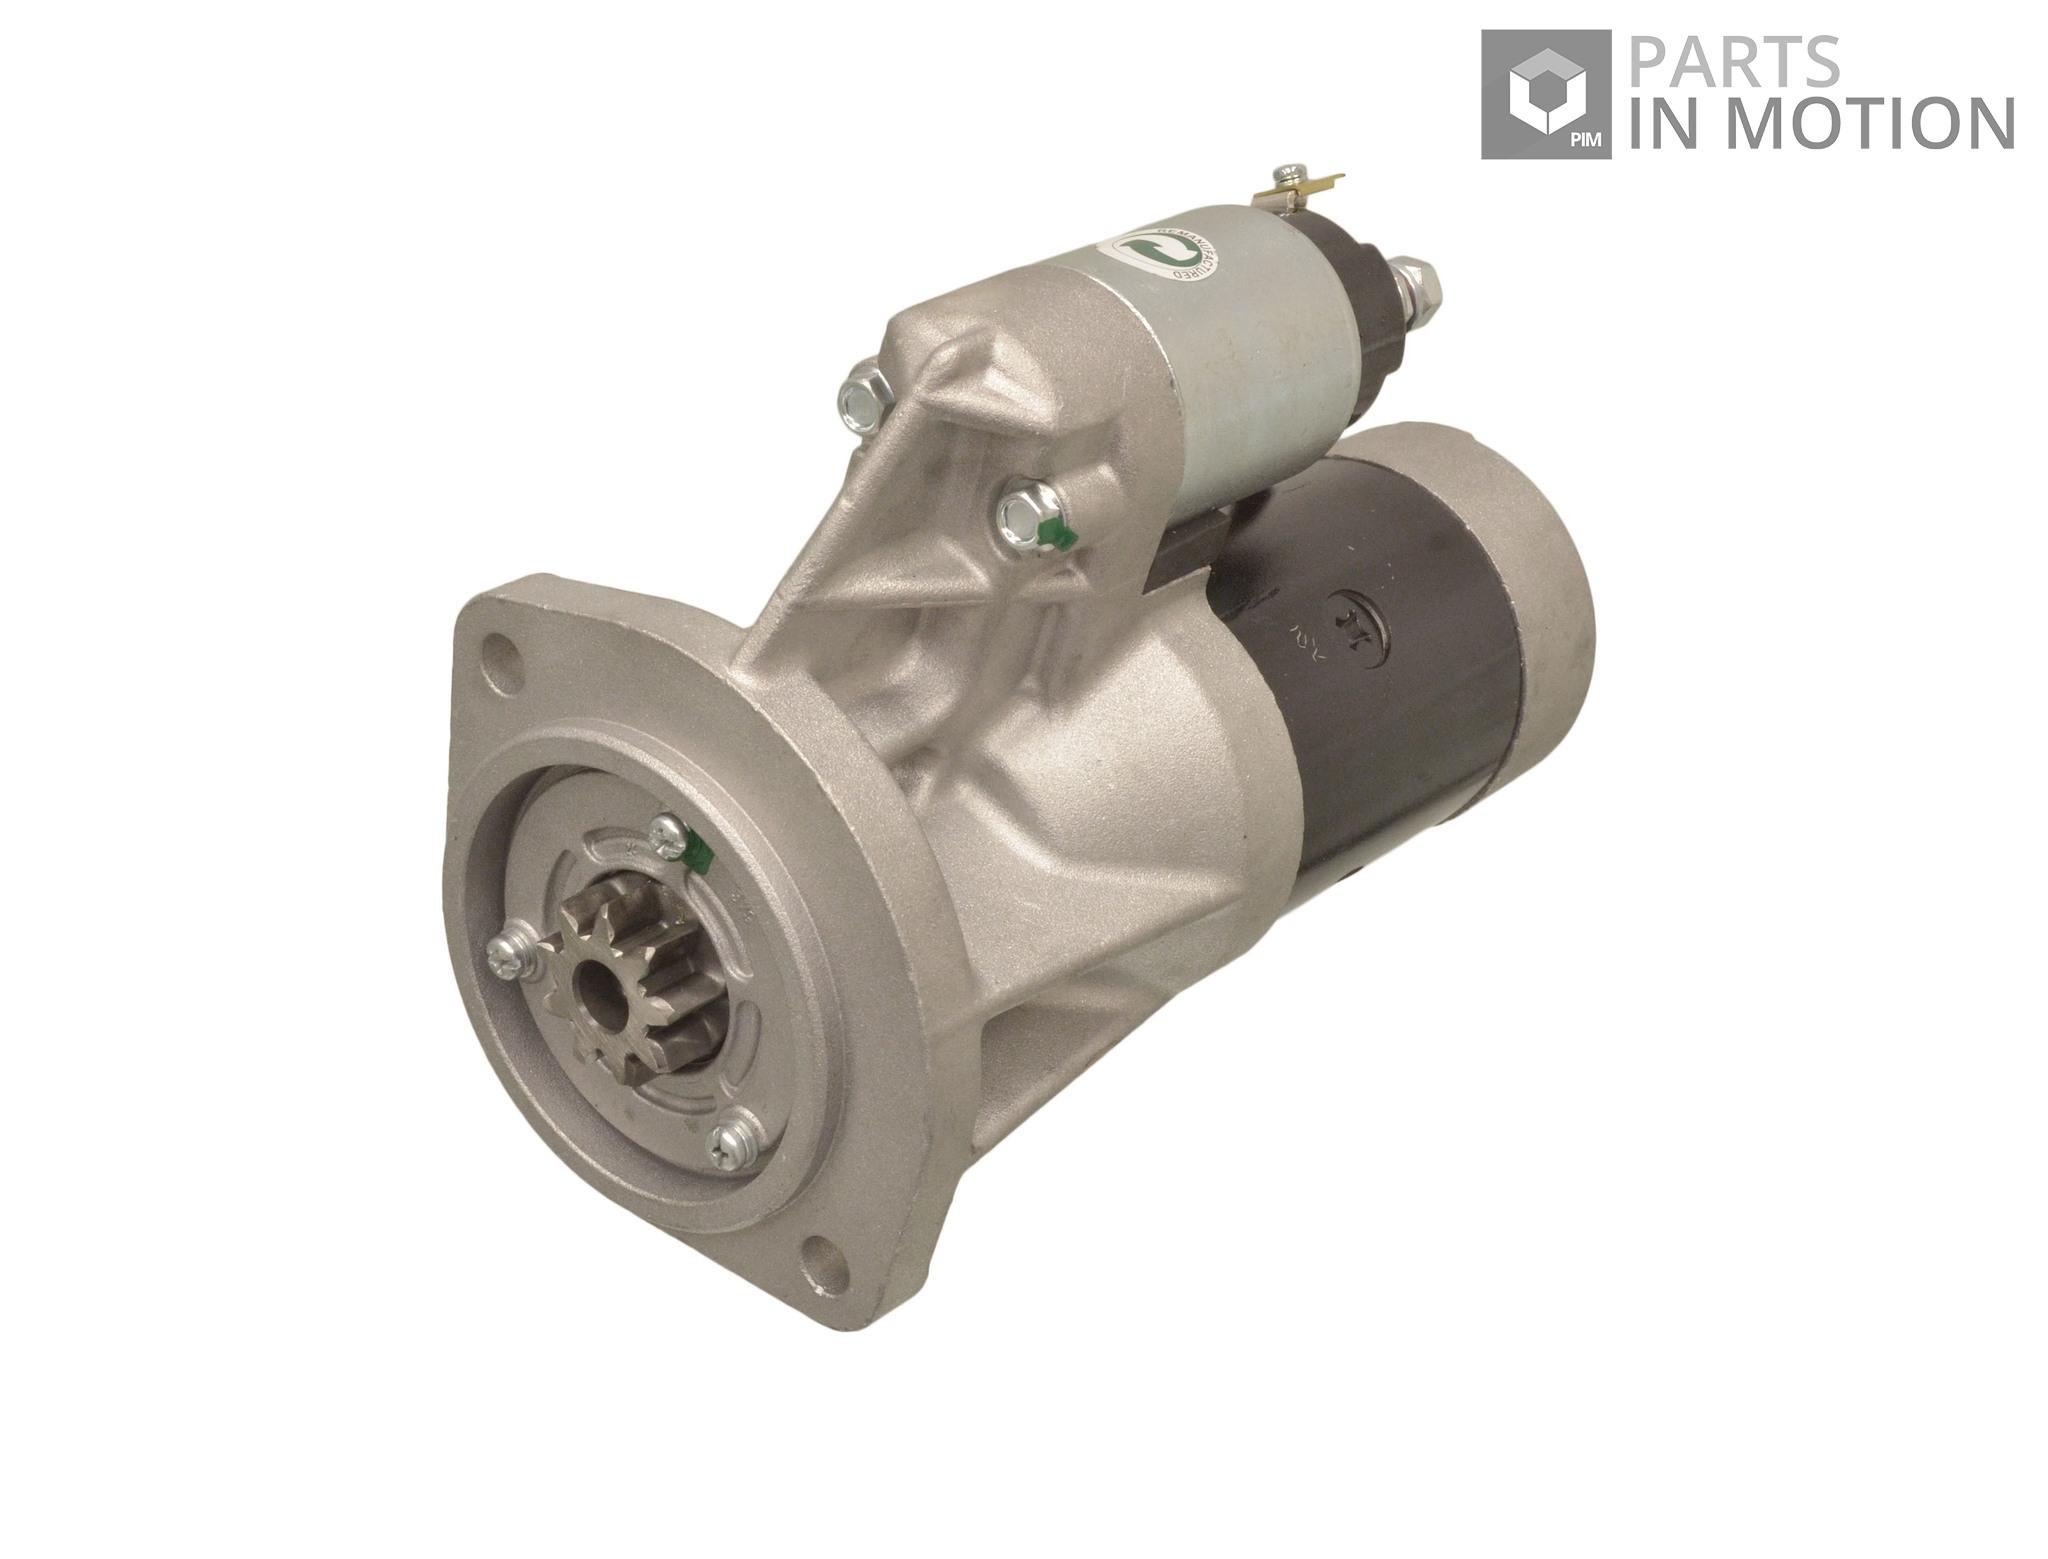 FORD MAVERICK 2.7D Starter Motor 93 to 98 ADL 1962439 Top Quality ...